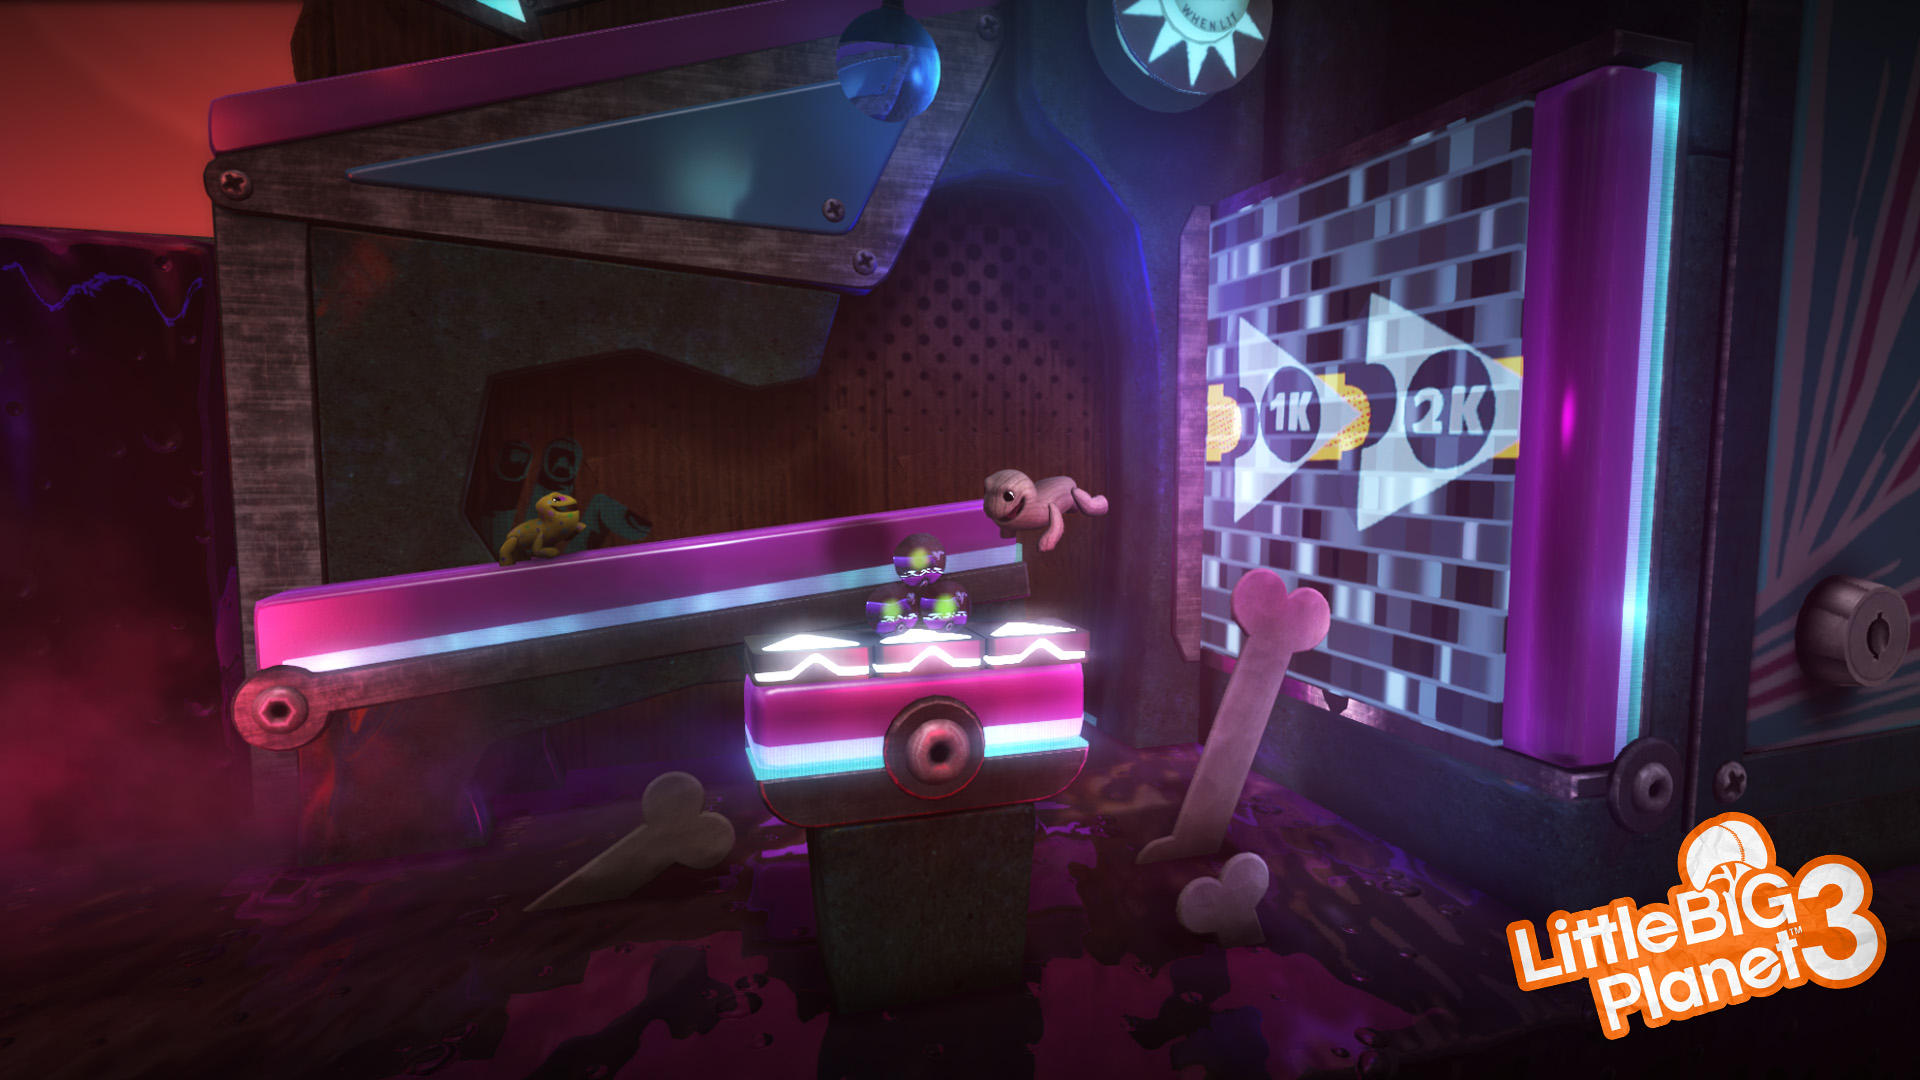 LittleBigPlanet3 PS4 Editeur 009